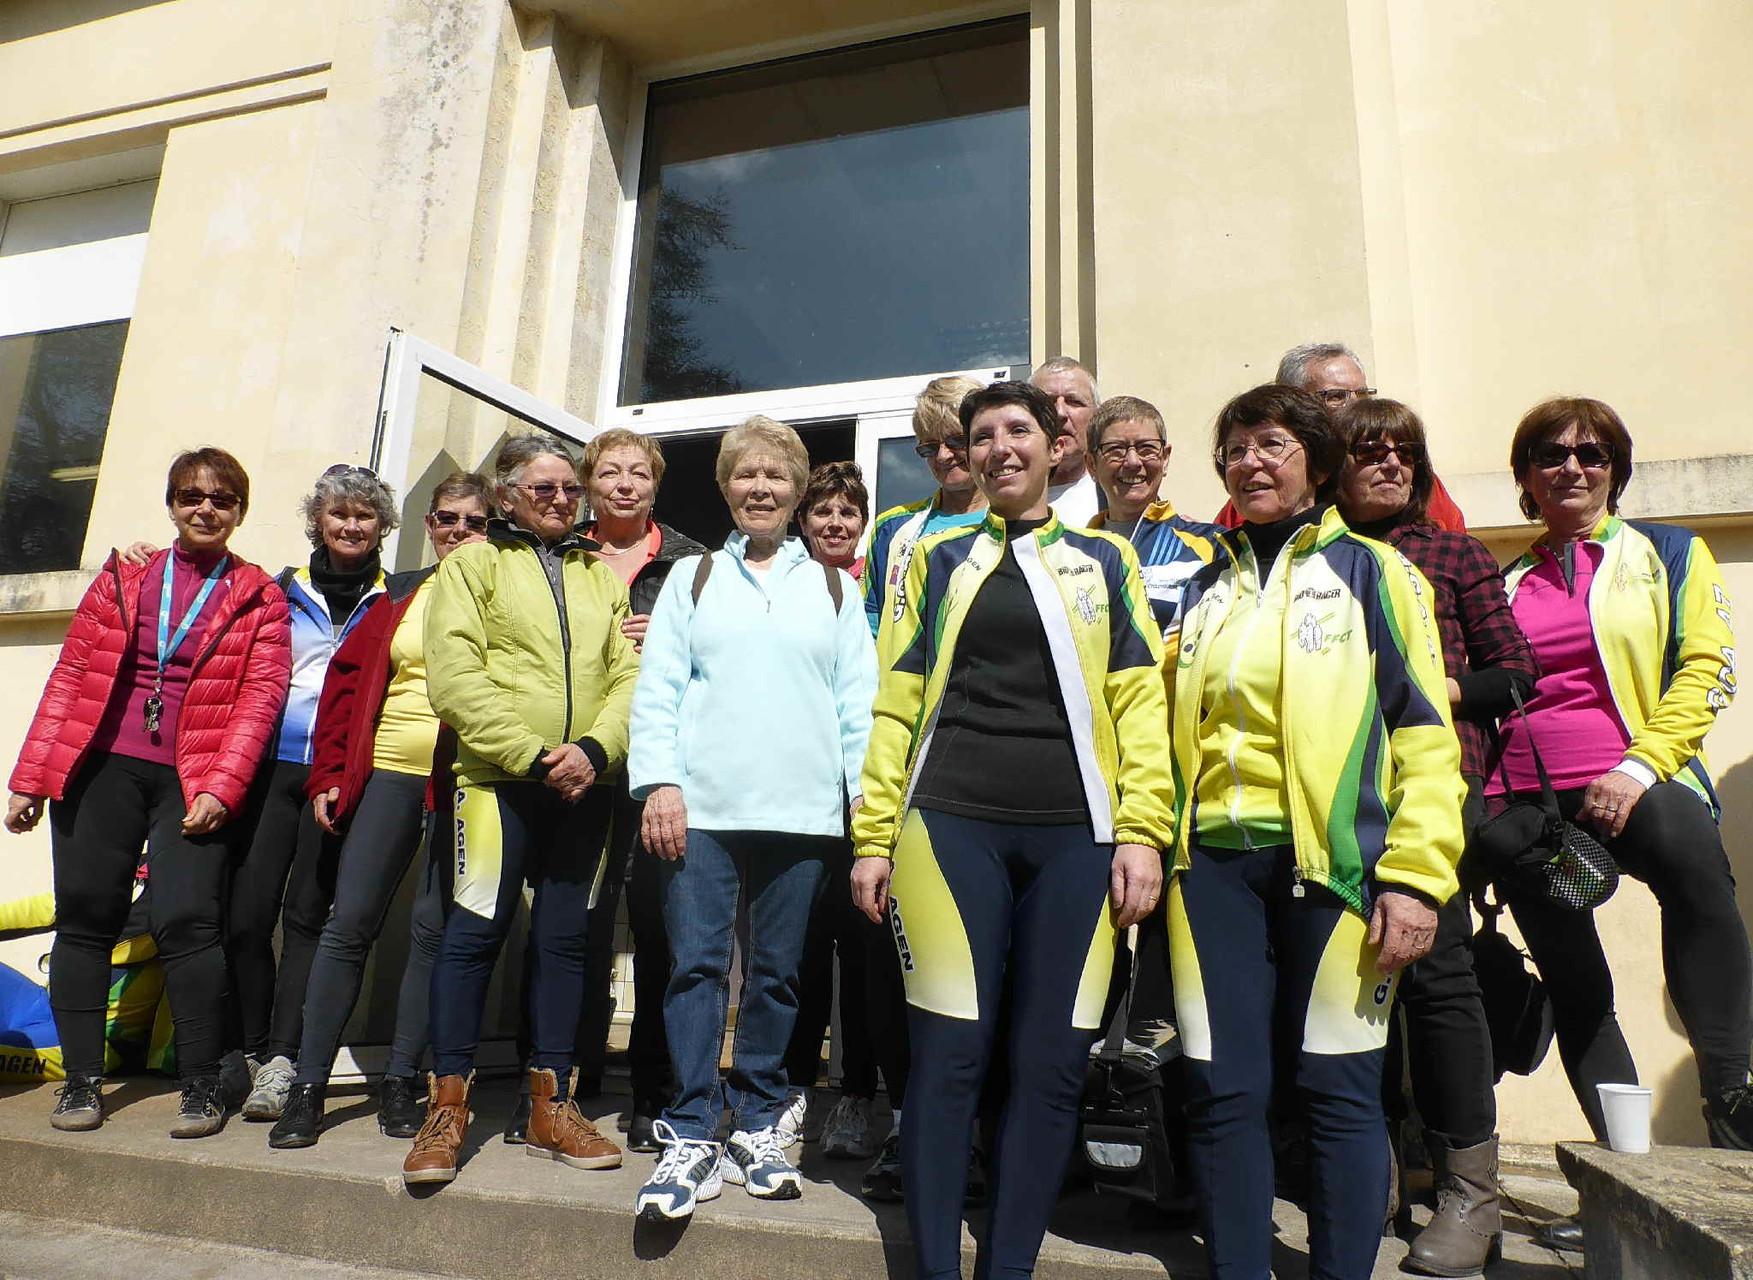 Nadine, Sylvie, Françoise,Josette ,Jeanine (cachée )Karine,Evelyne,Gigi,Babeth, Daniel,Lulu, Christine,Michèle,Gégé, et  Monique